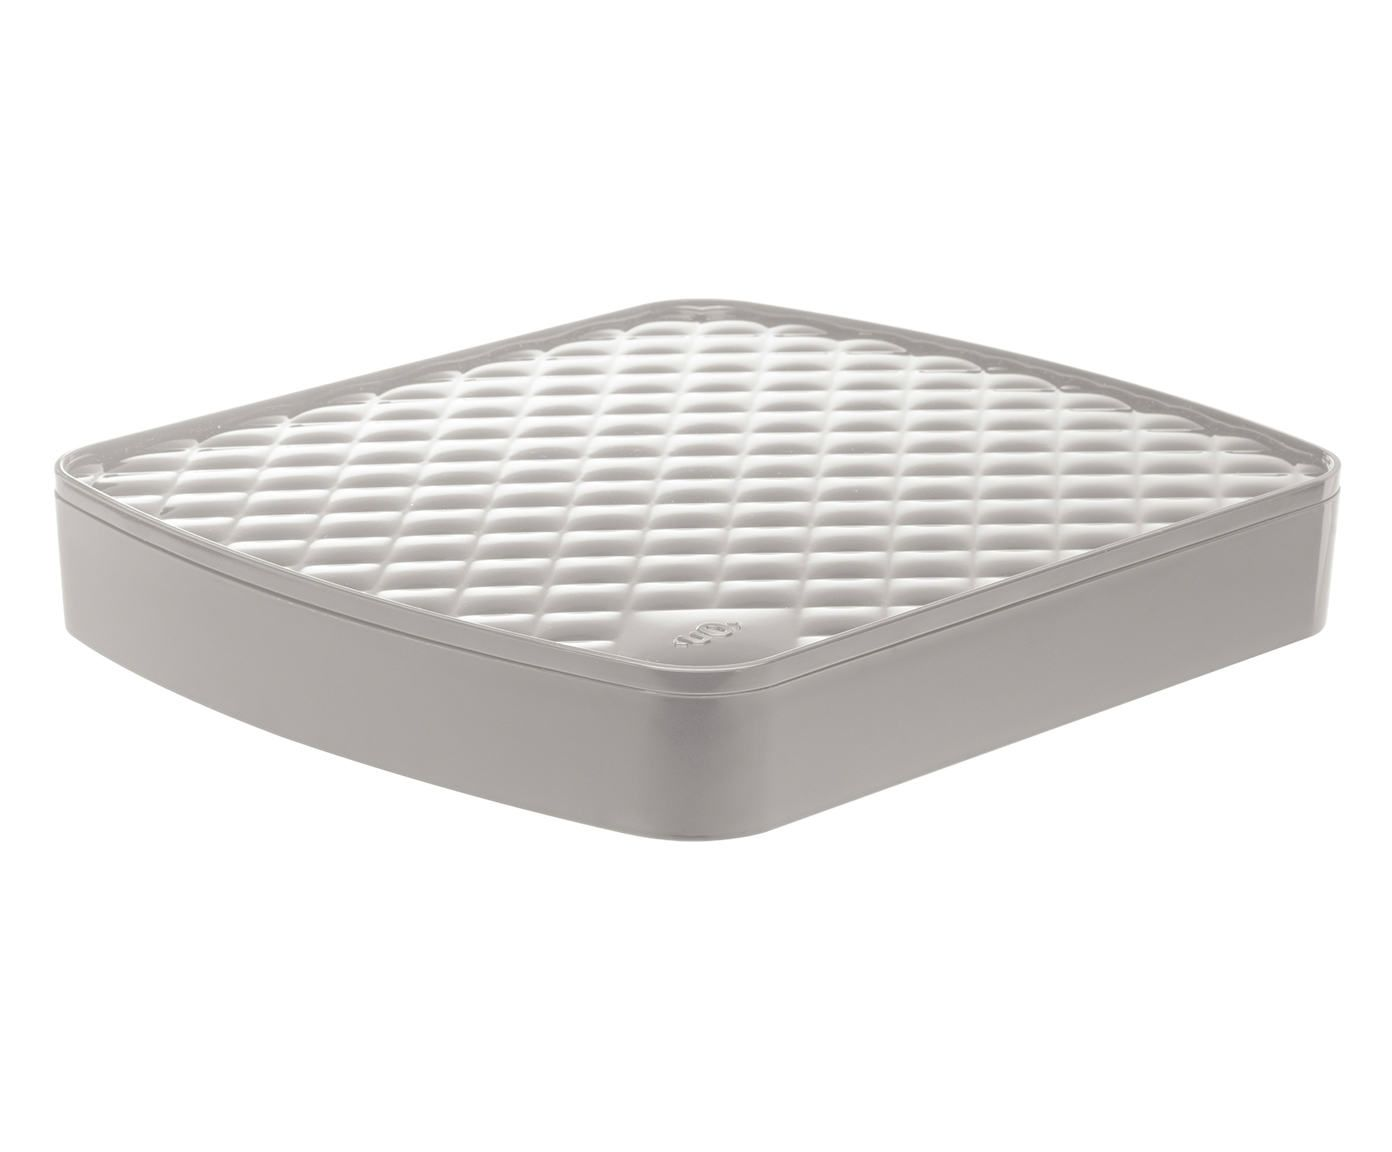 Organizador Box Branco - 27x23,5cm | Westwing.com.br